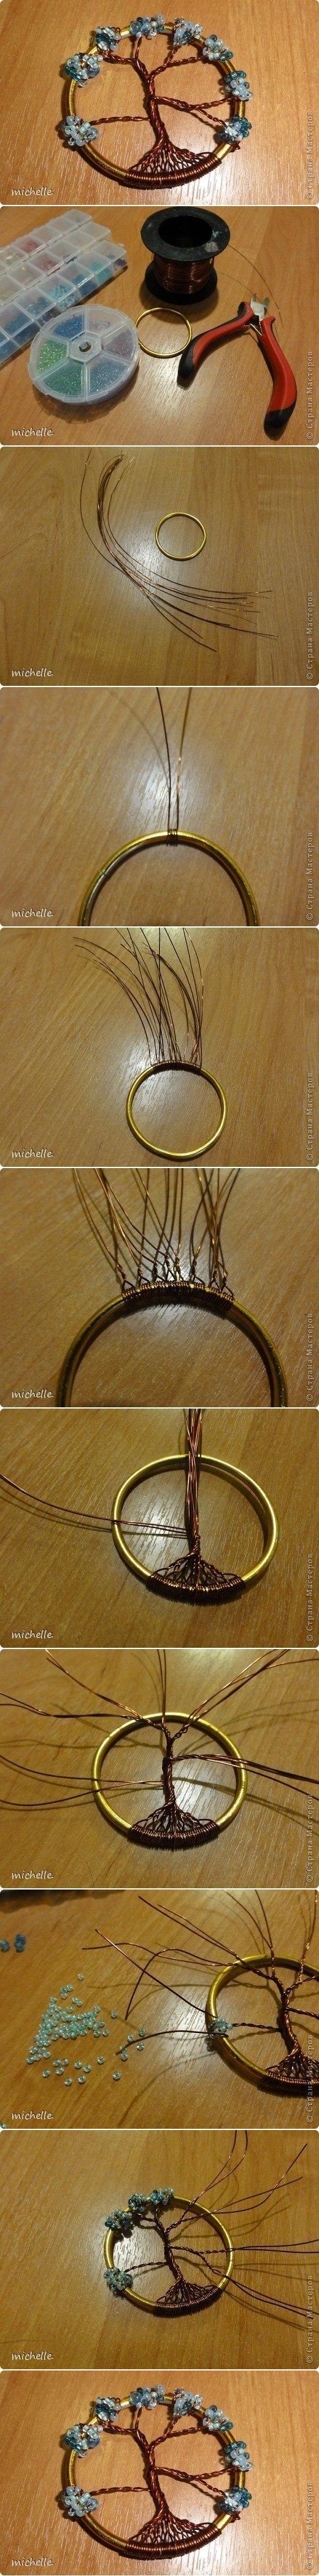 DIY Tree of Life DIY Projects | UsefulDIY.com Follow us on Facebook ==> https://www.facebook.com/UsefulDiy